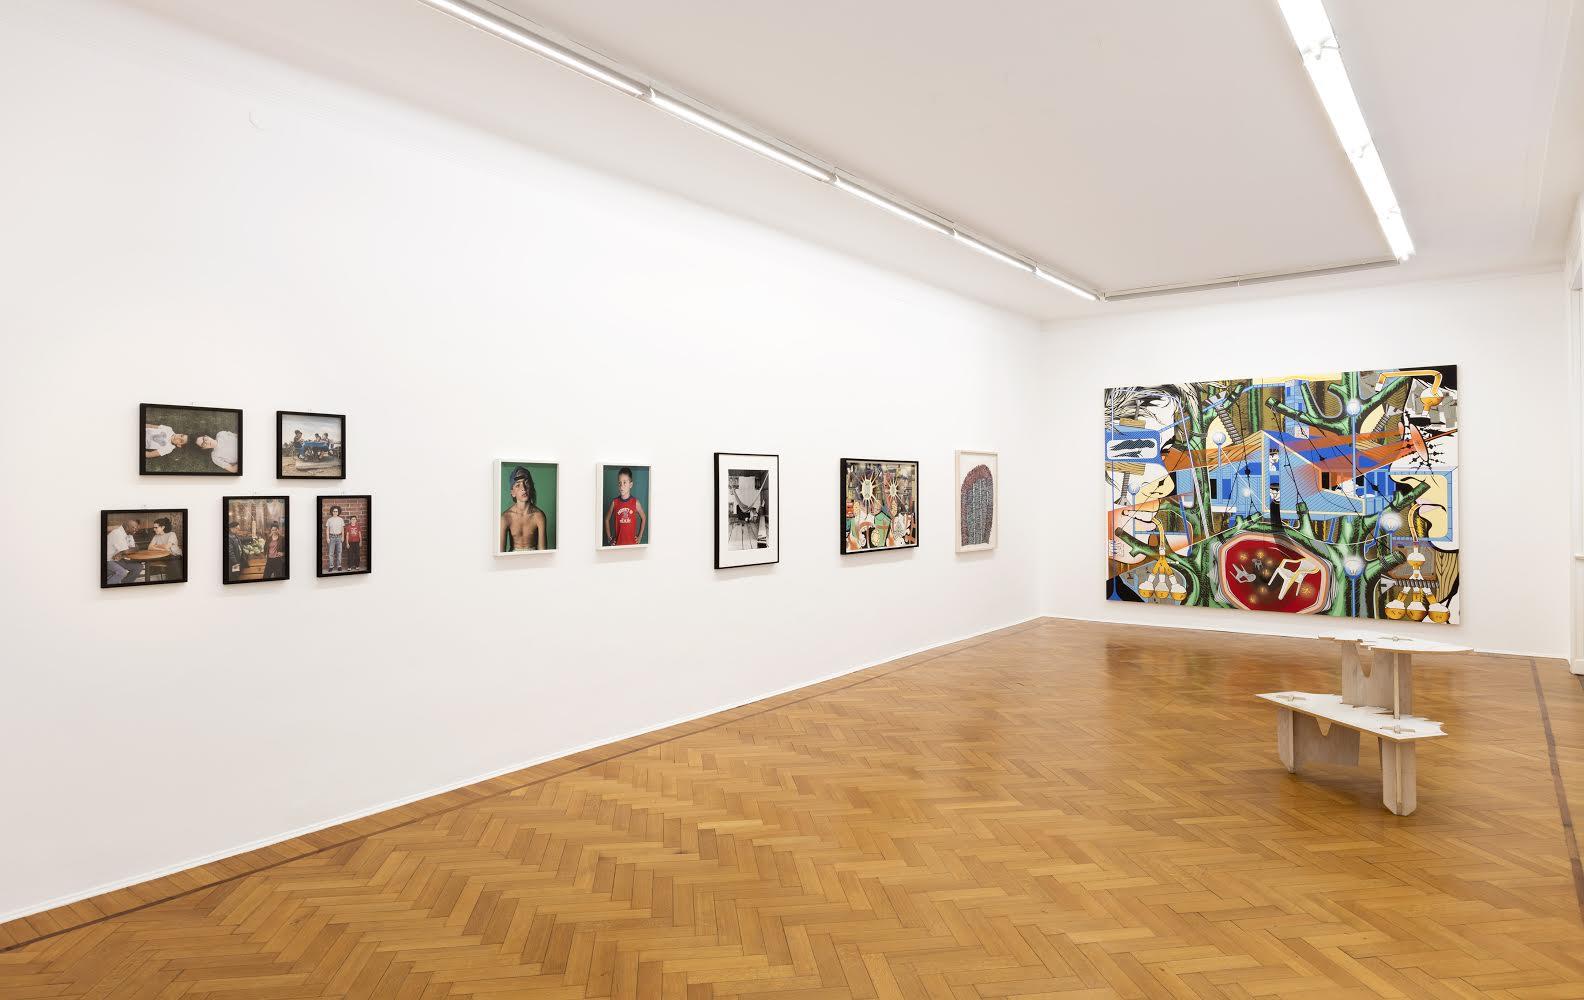 Art from Los Angeles 1990-2010 - installation view at Studio Guenzani, Milano 2016